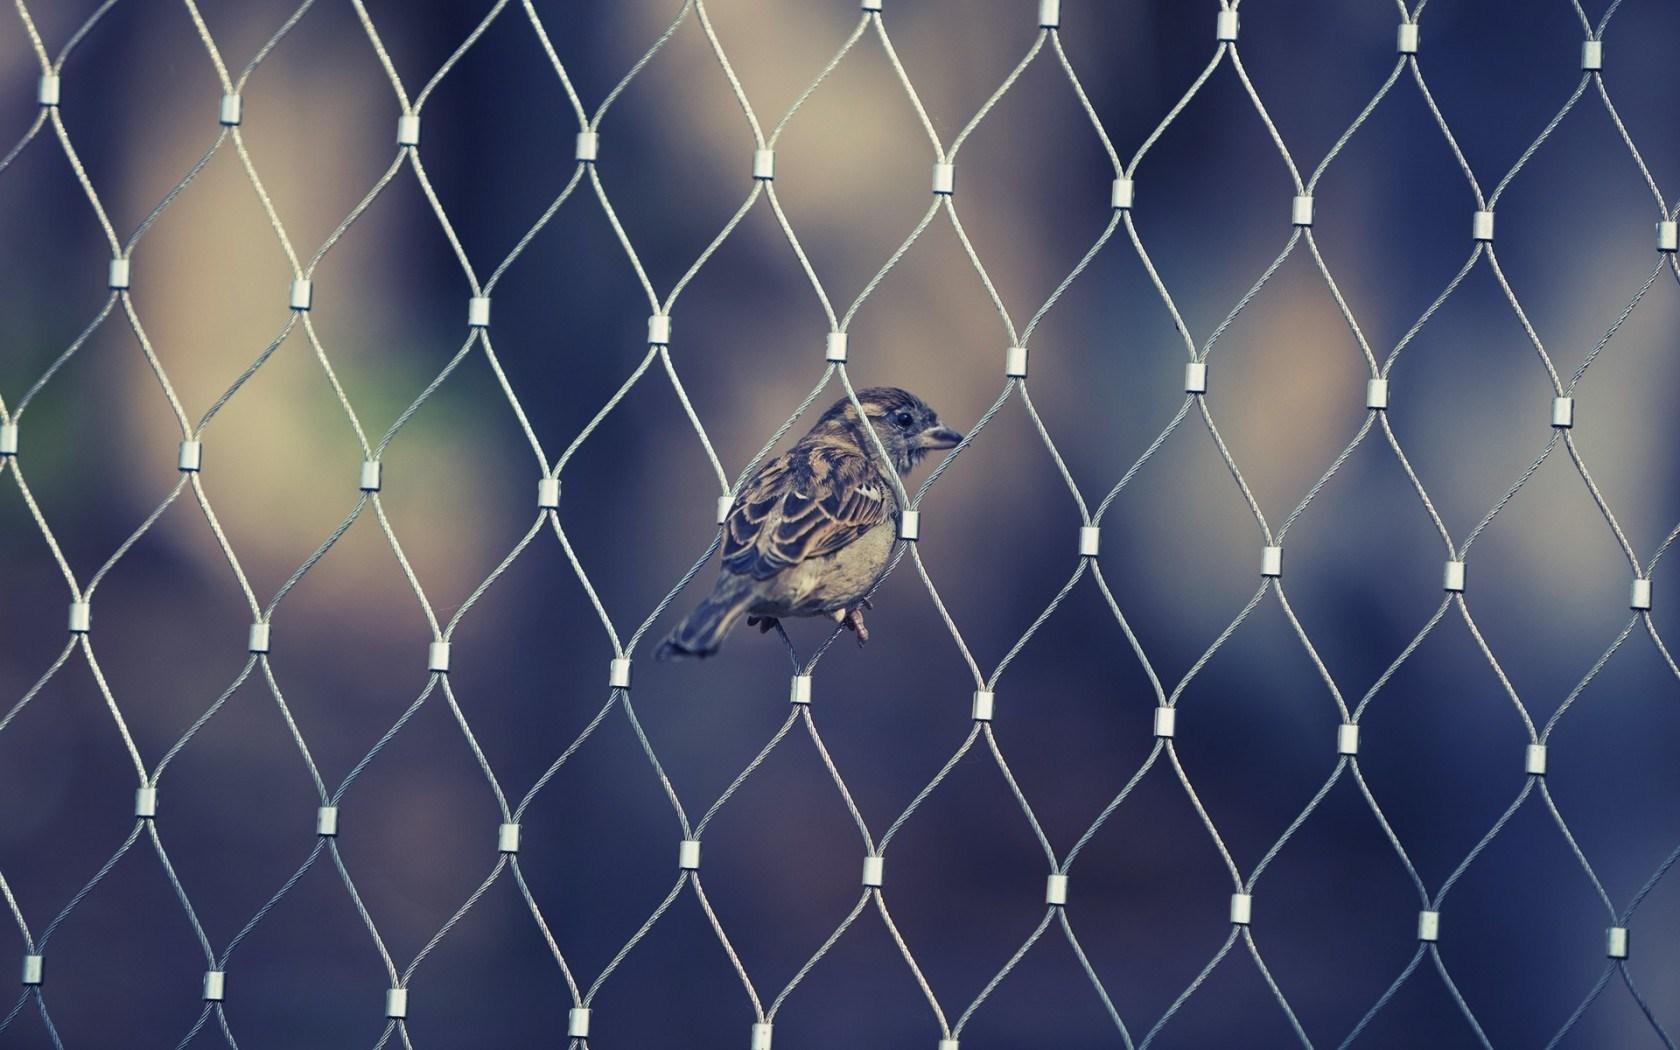 Fence Bird Sparrow Awesome Photo